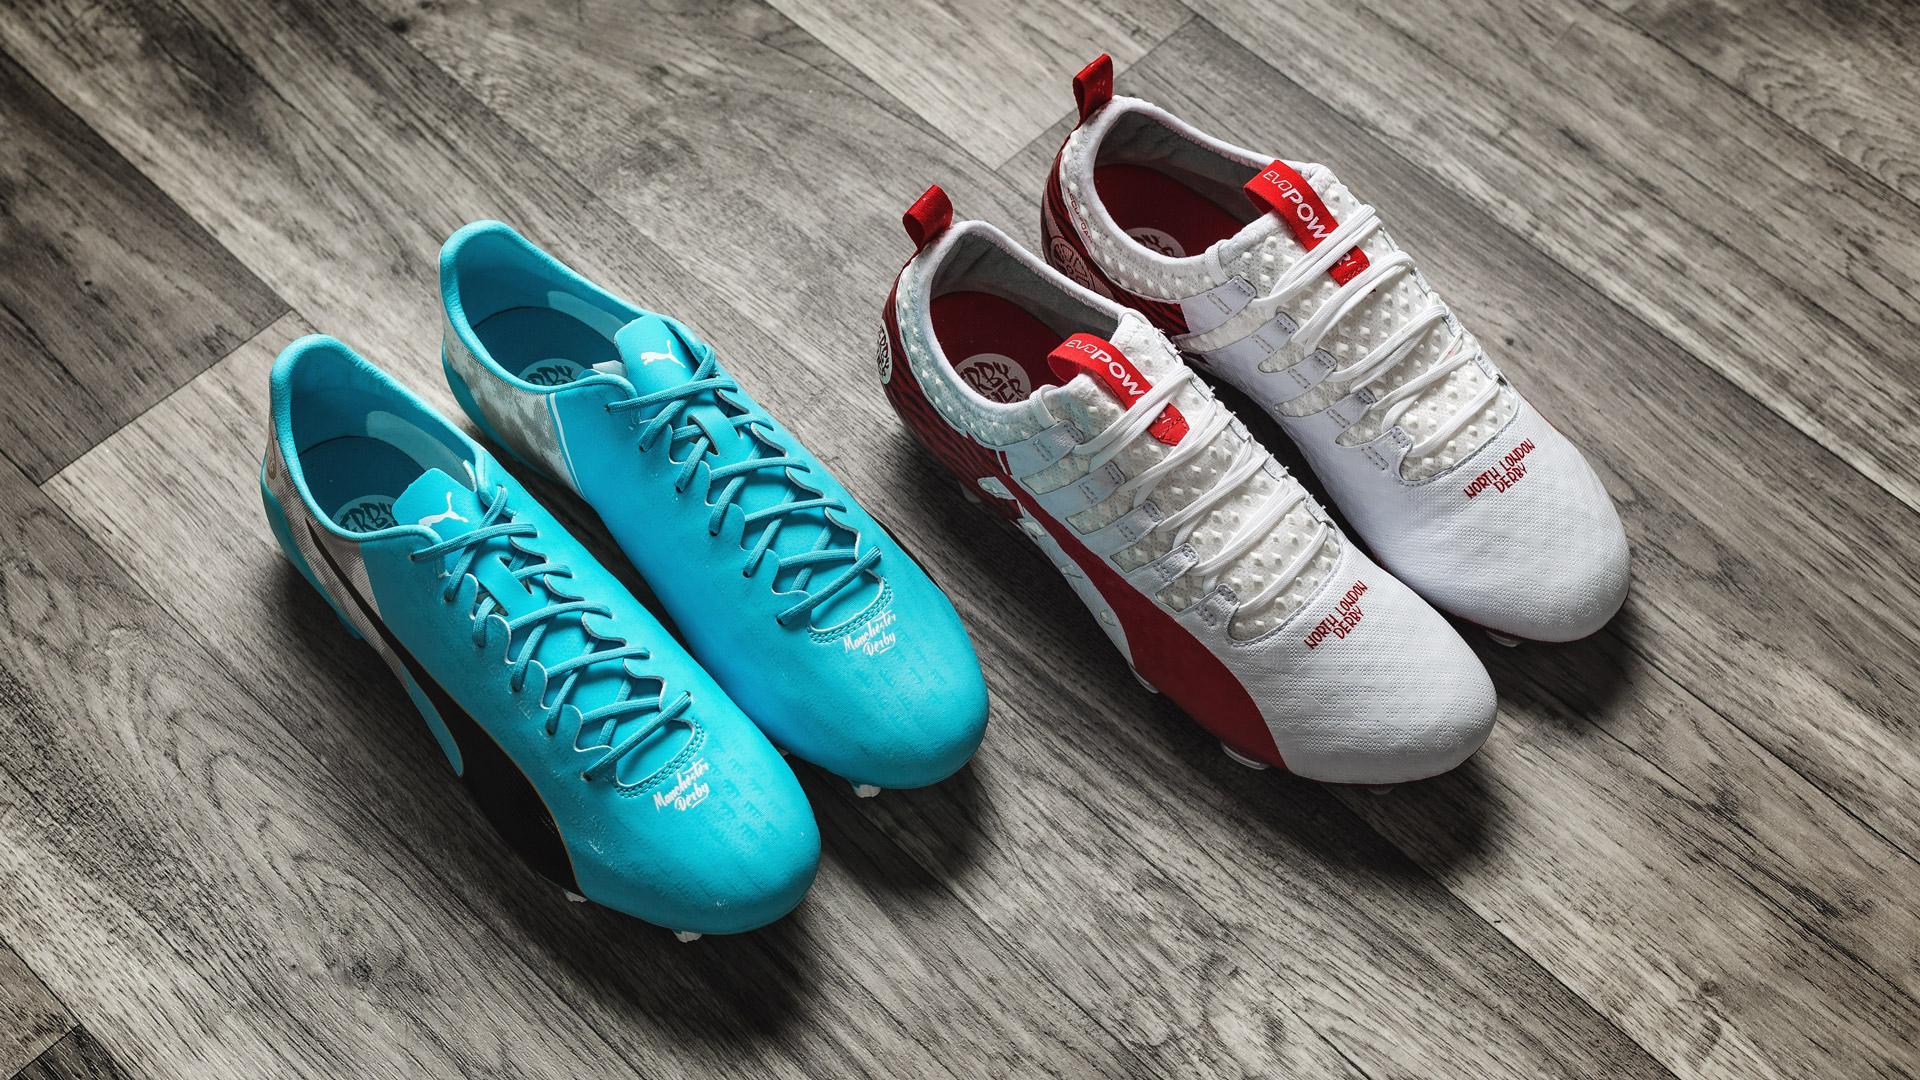 hermoso estilo nueva llegada seleccione original PUMA Derby Fever Pack | Olivier Giroud and Sergio Agüero